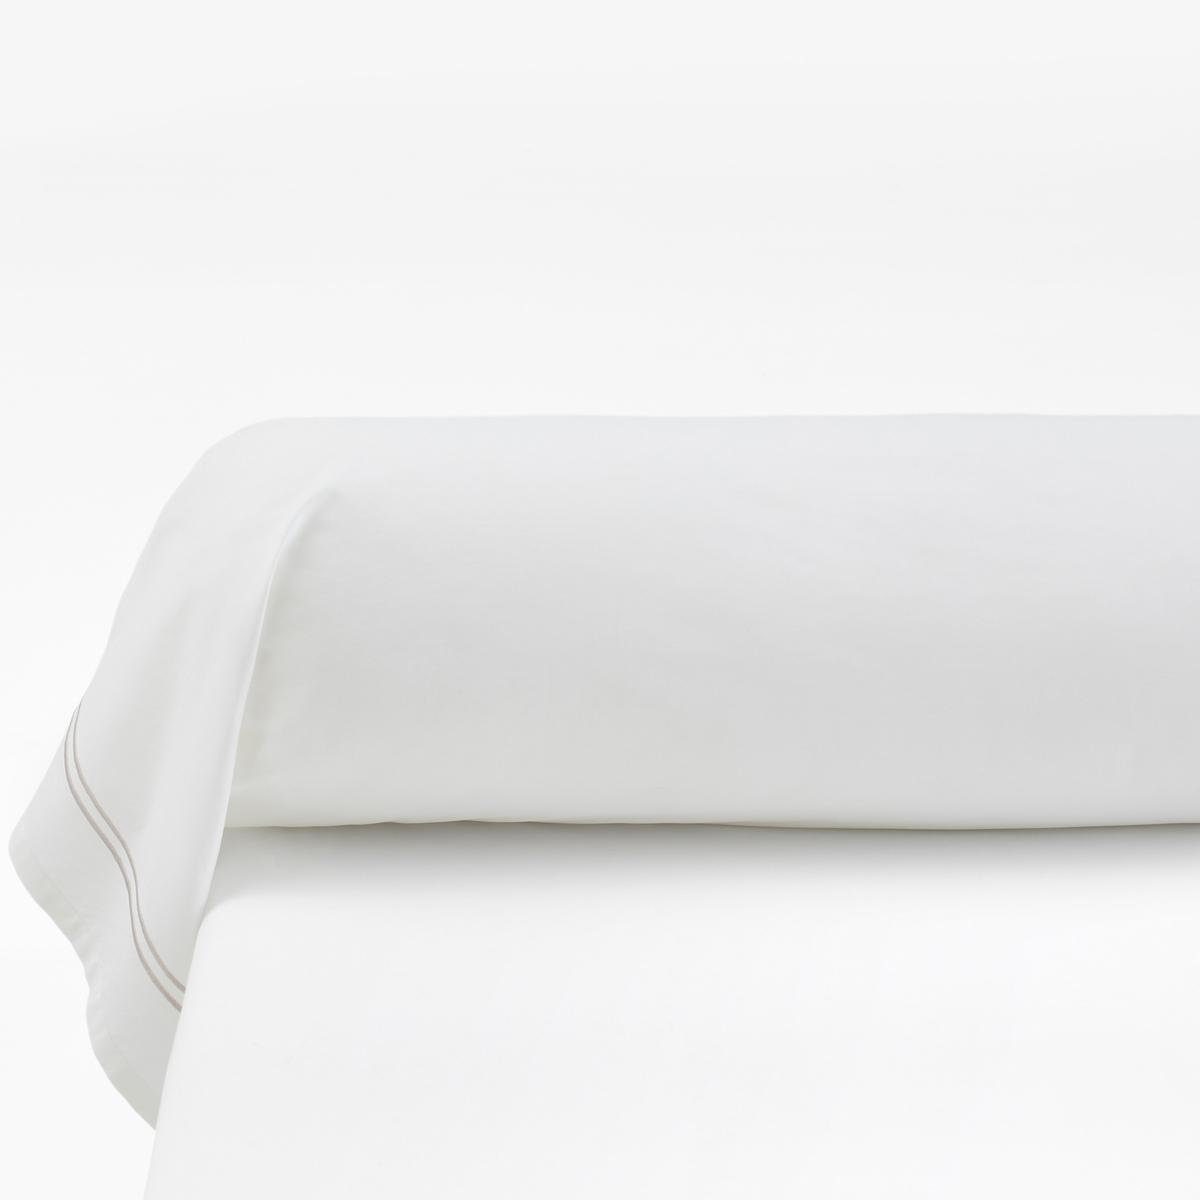 наволочки на подушку и наволочка на подушку валик из хлопка richmond Наволочка LaRedoute На подушку-валик из перкали 100 хлопок 85 x 185 см белый